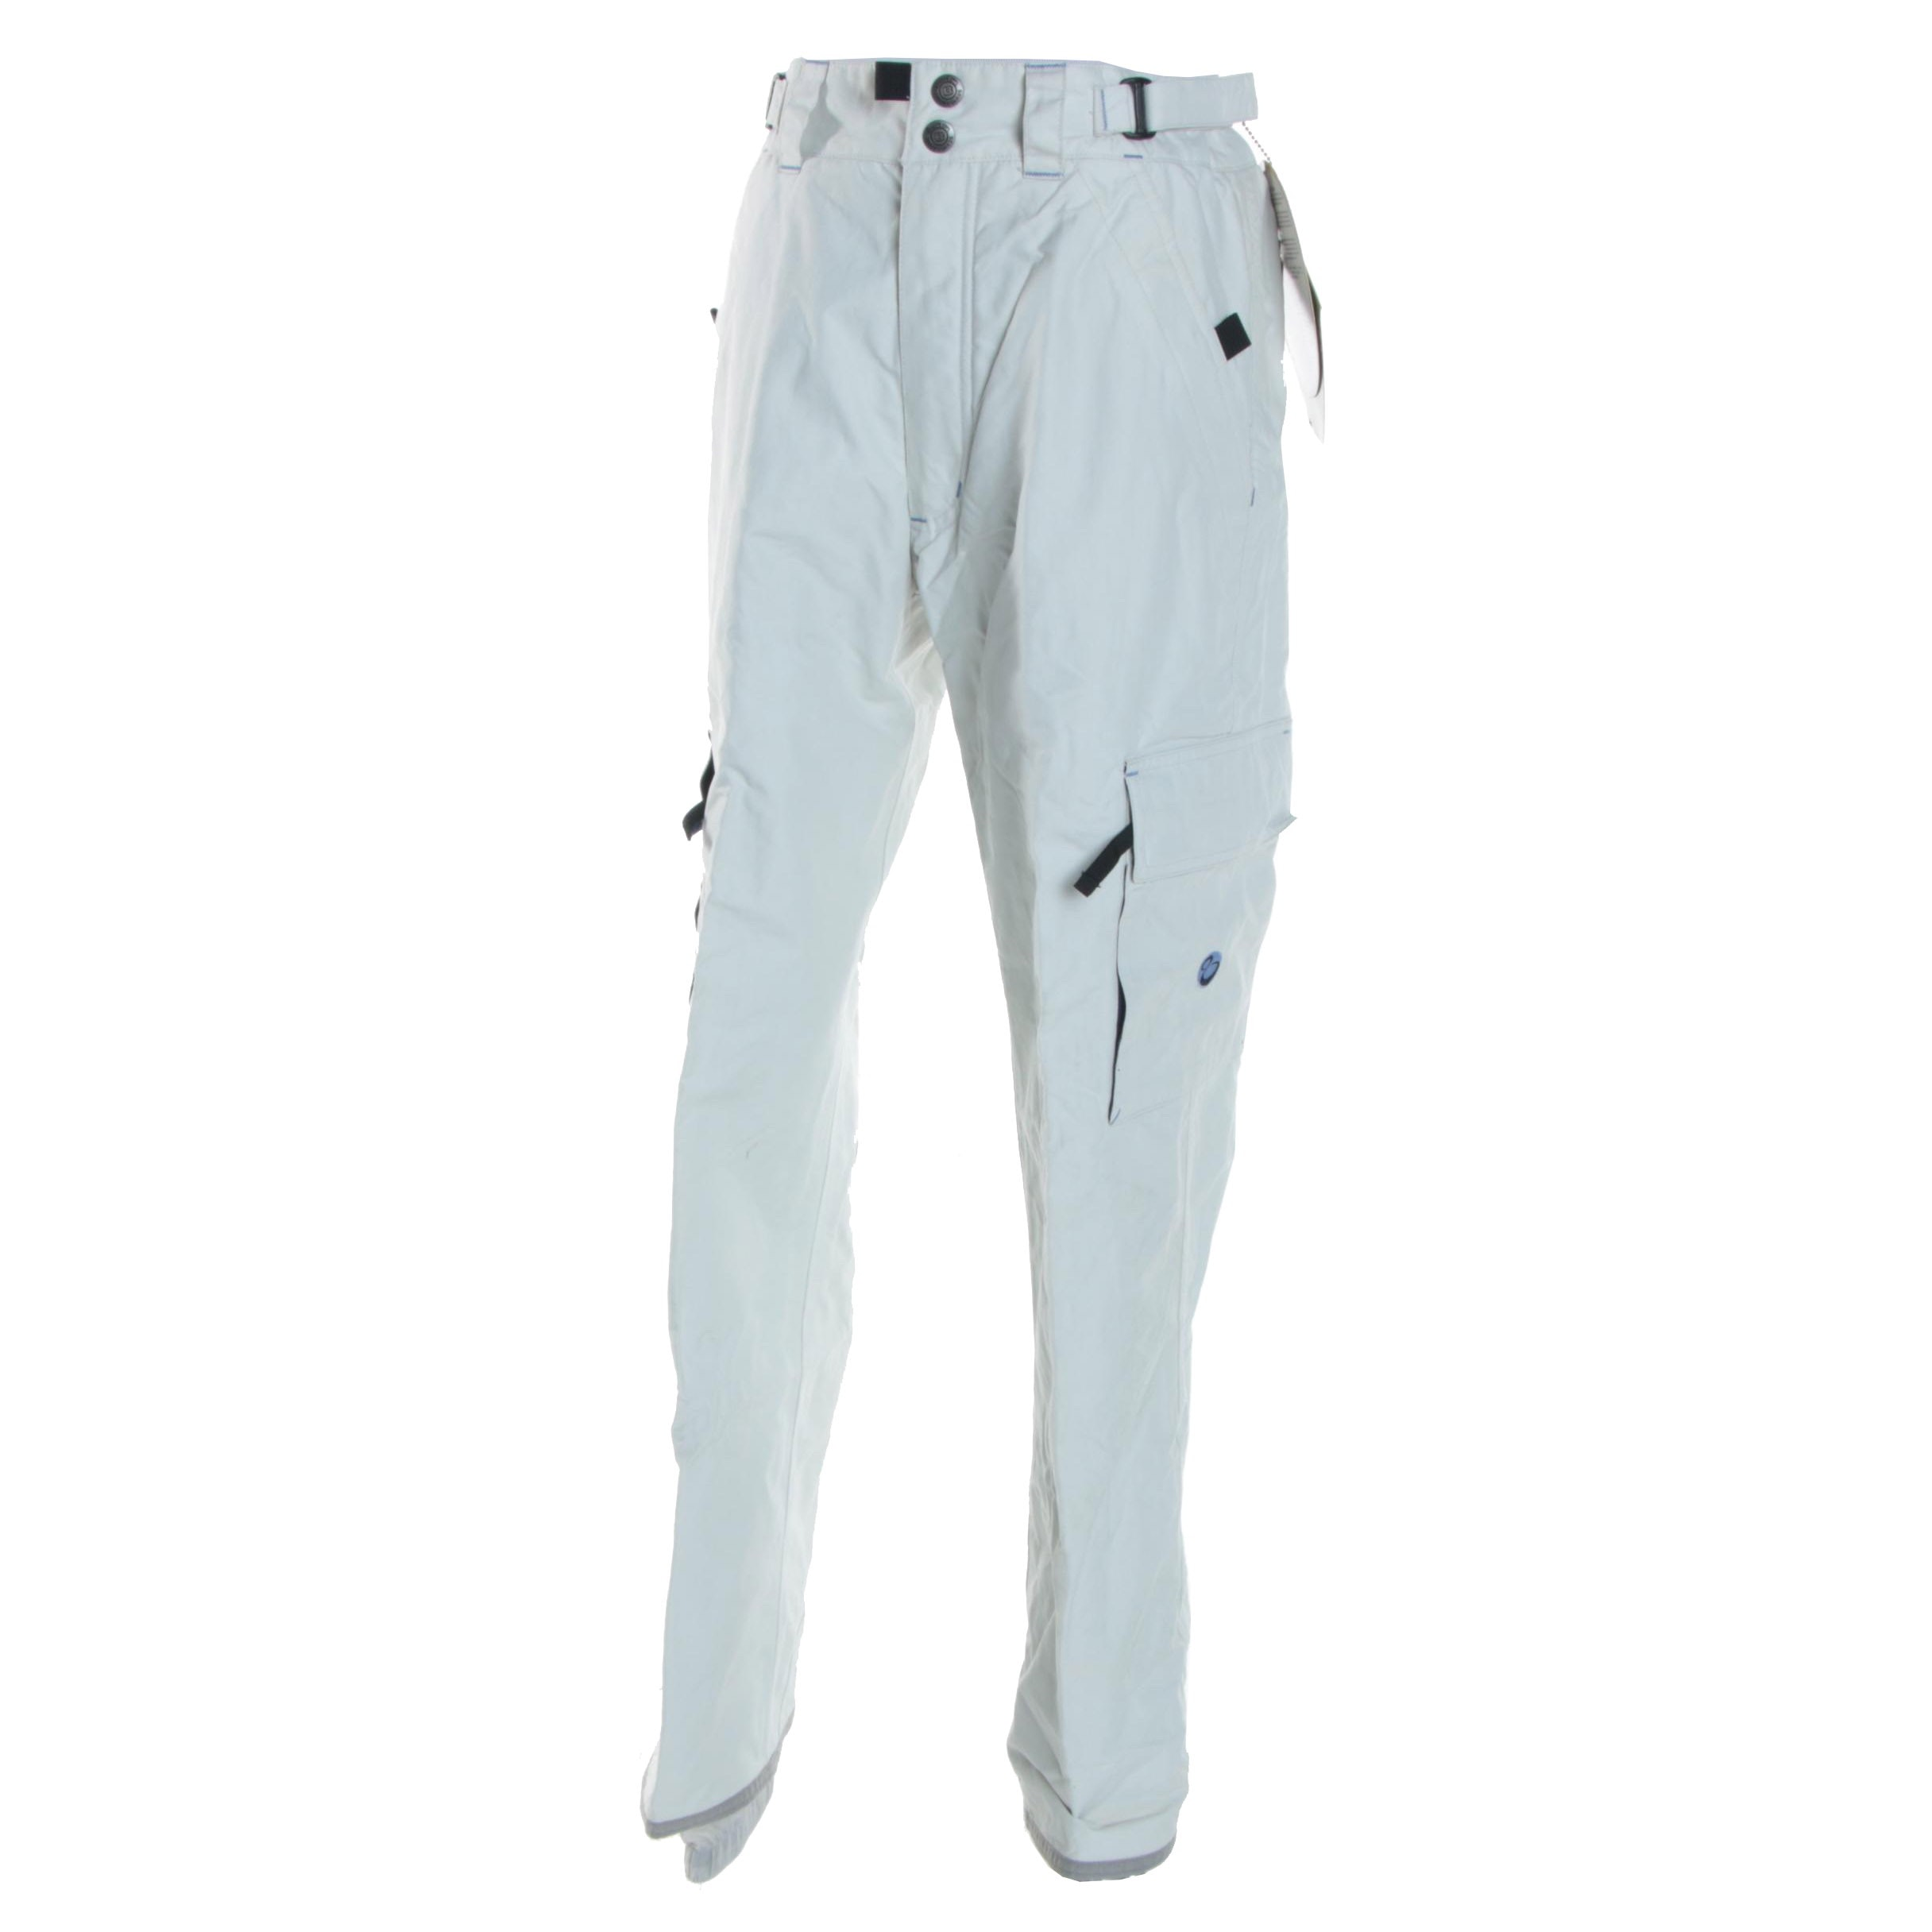 Women's Burton Bio-Lite White Snowboarding Cargo Pants